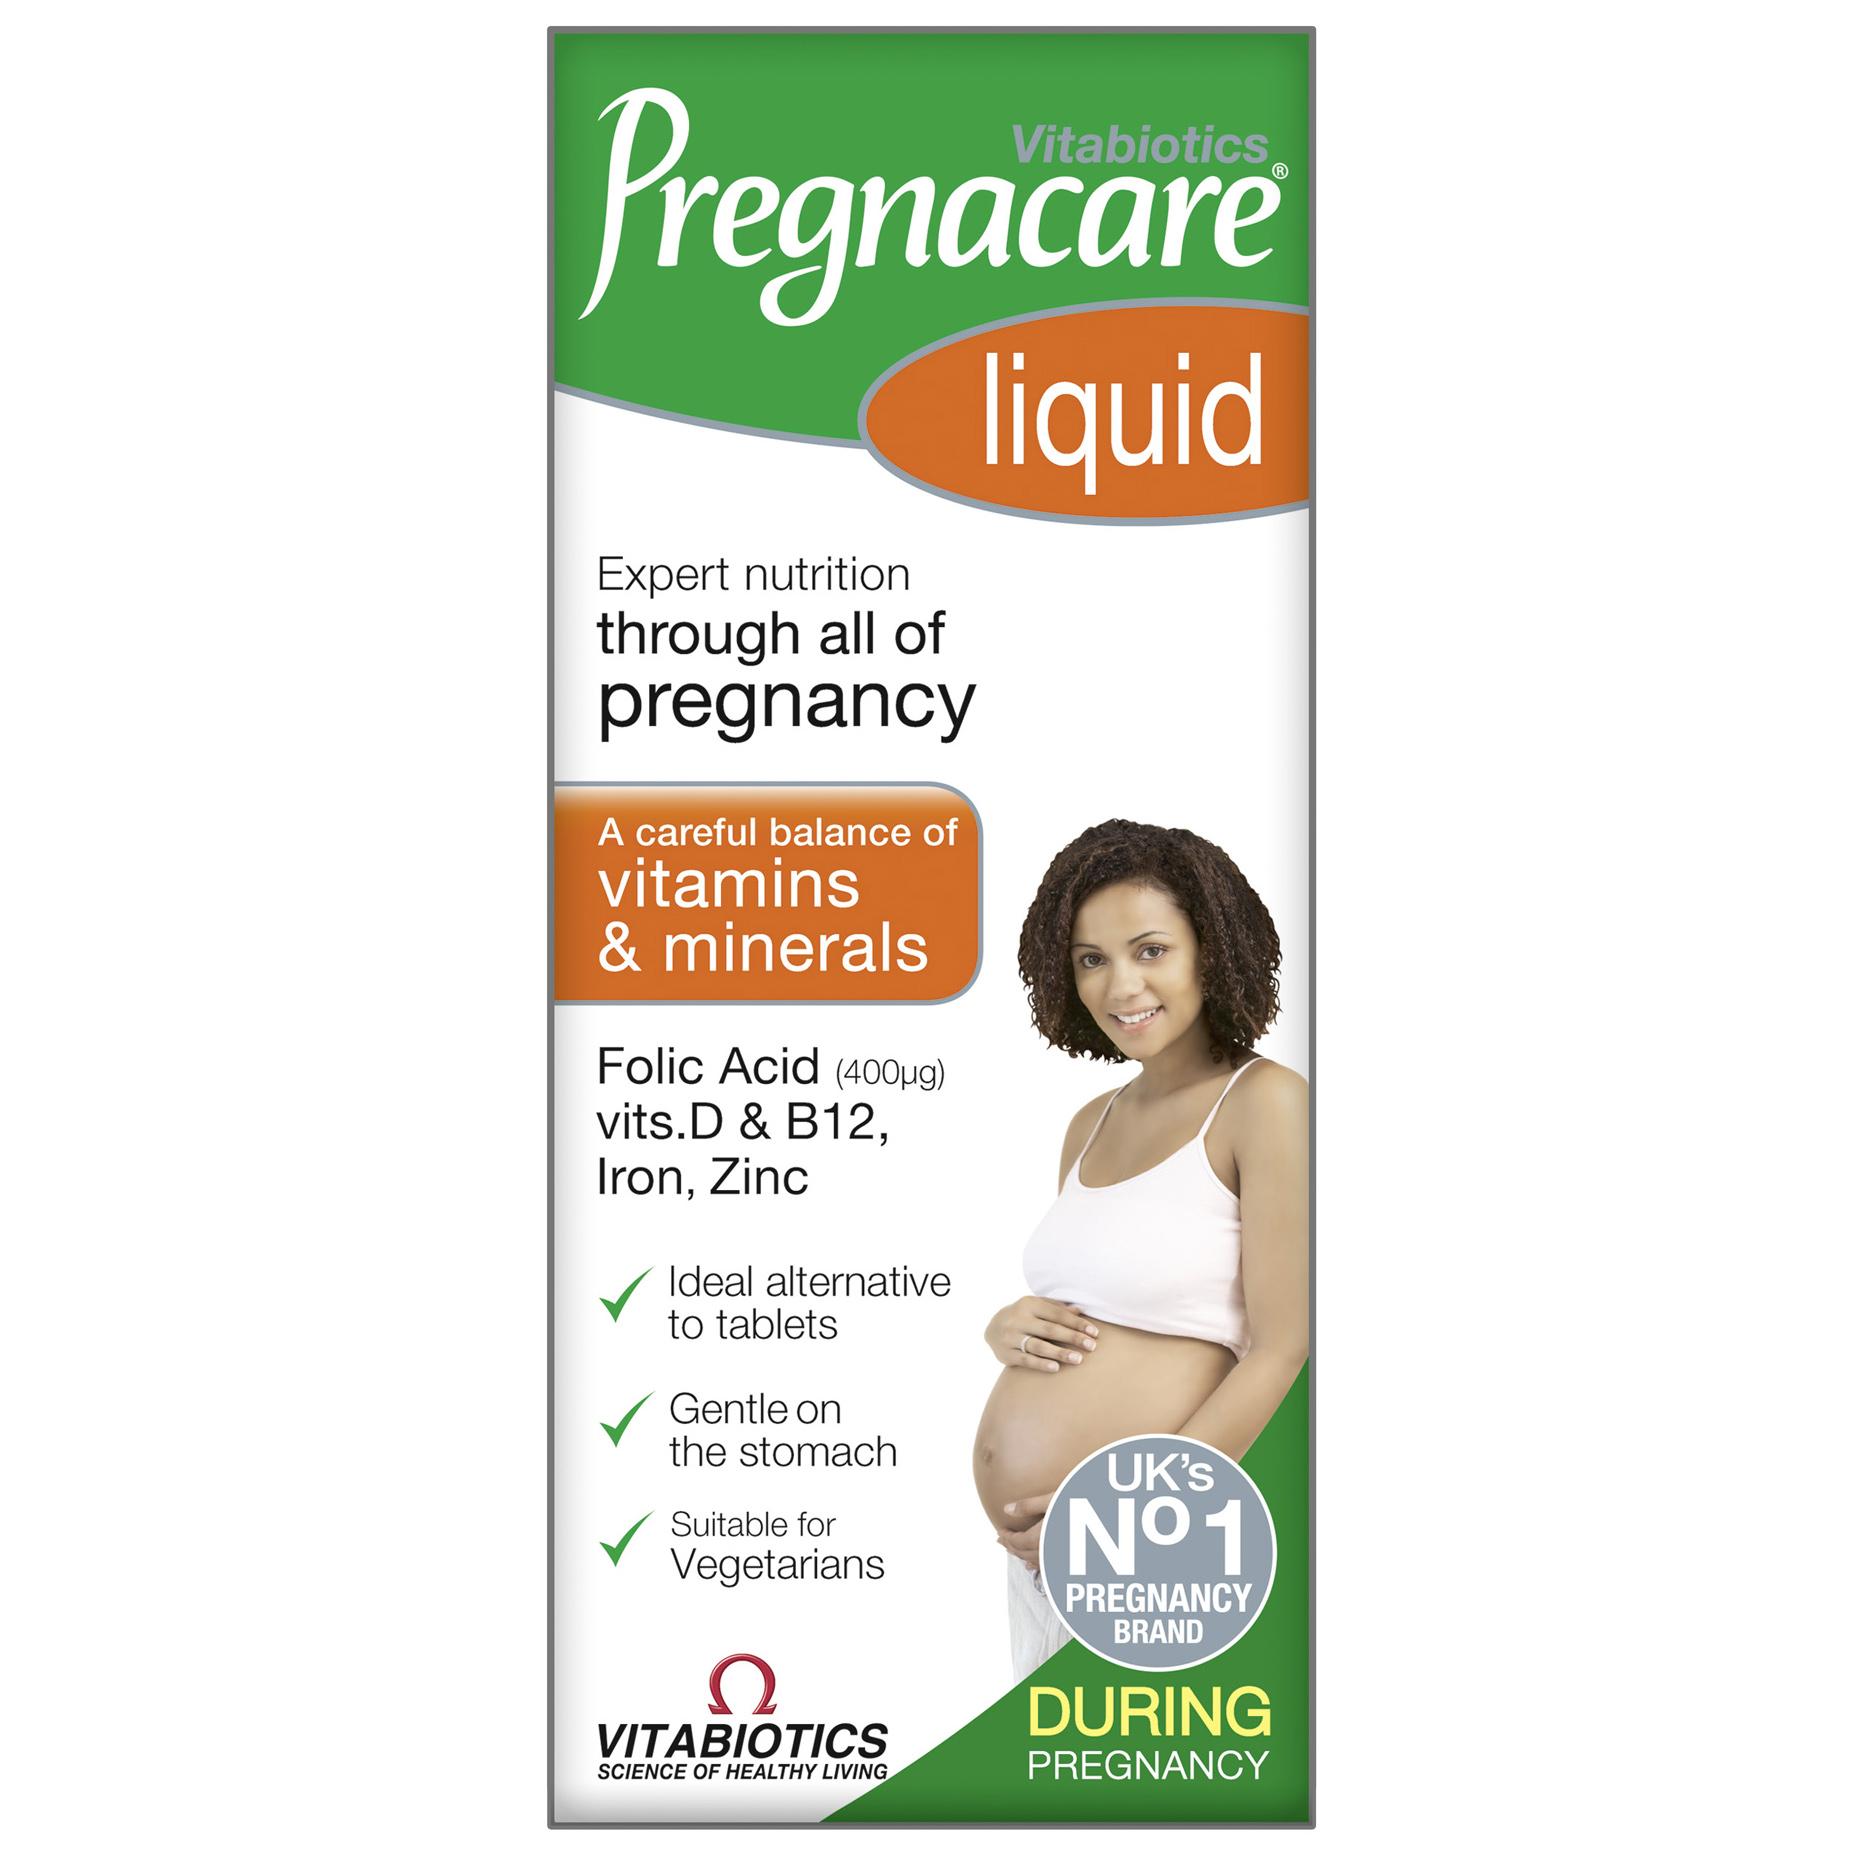 Vitabiotics Pregnacare Liquid Πόσιμο Συμπλήρωμα για τη Διατροφική Υποστήριξη των Γυναικών Κατά την Περίοδο της Εγκυμοσύνης 200ml